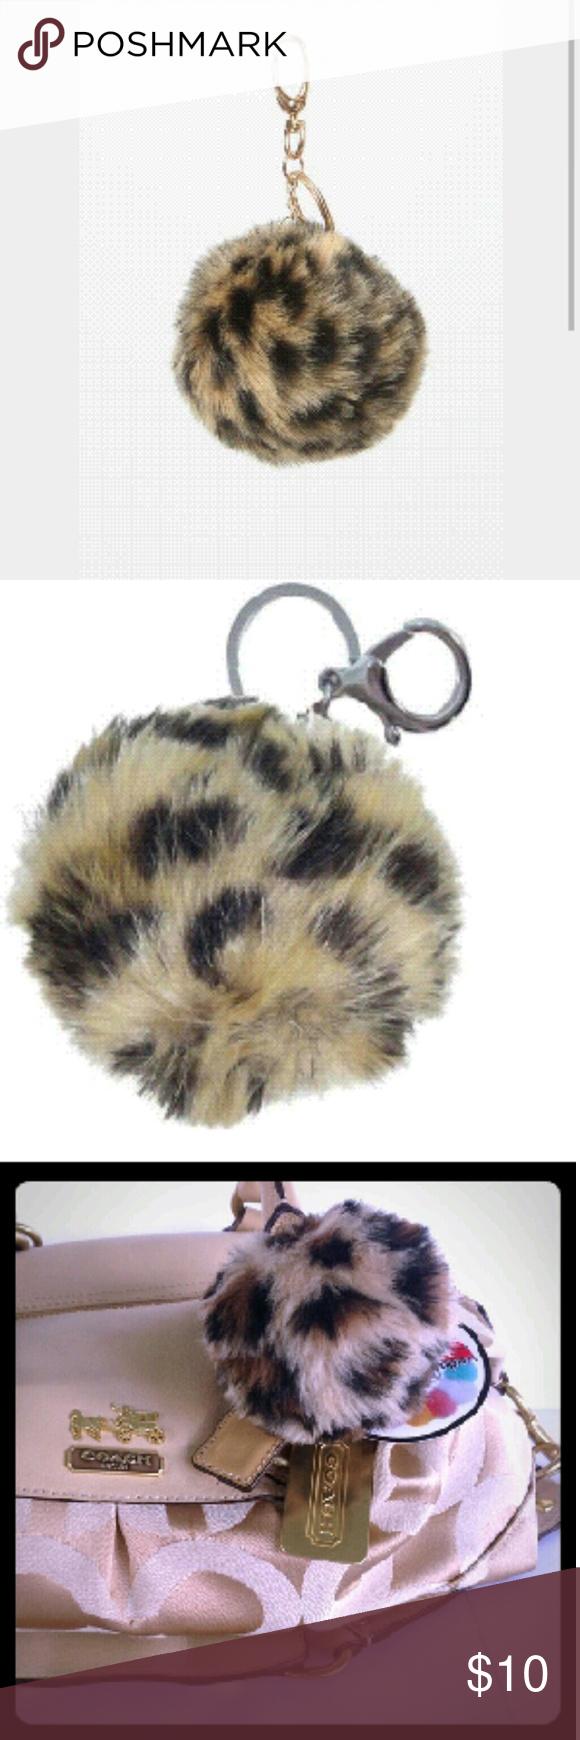 NWT cheetah pom pom keychain Adorable nwt cheetah print pom pom keychain, so cute on any size purse!! :-)   Accessories